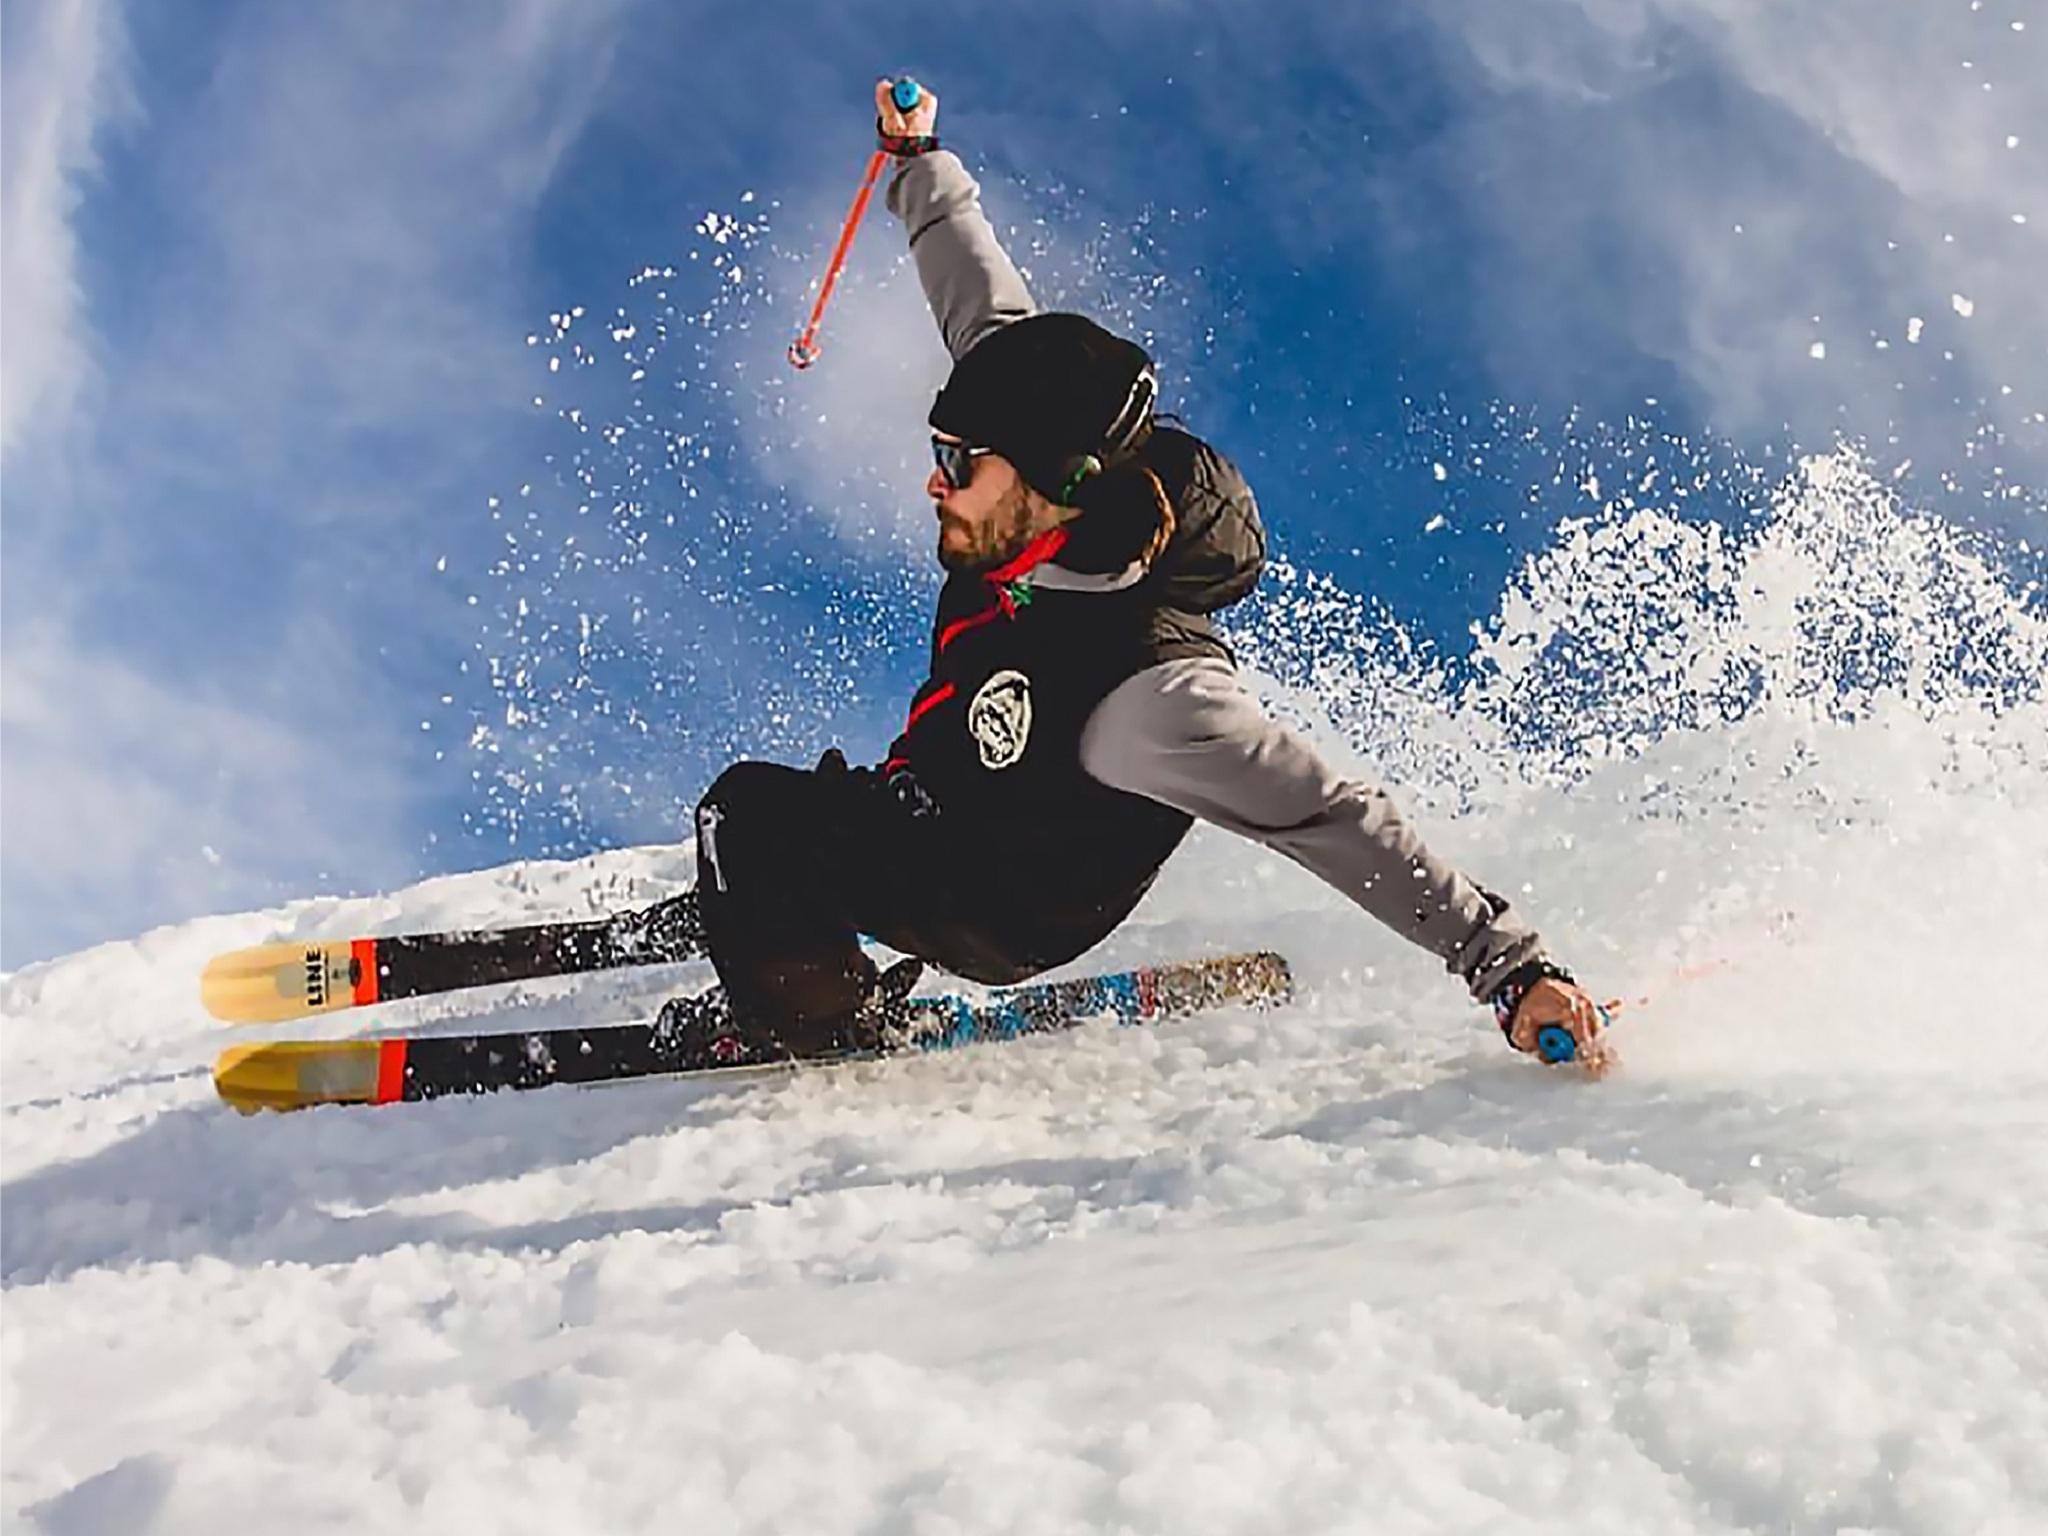 Desportos de Inverno, GoPro, Sky